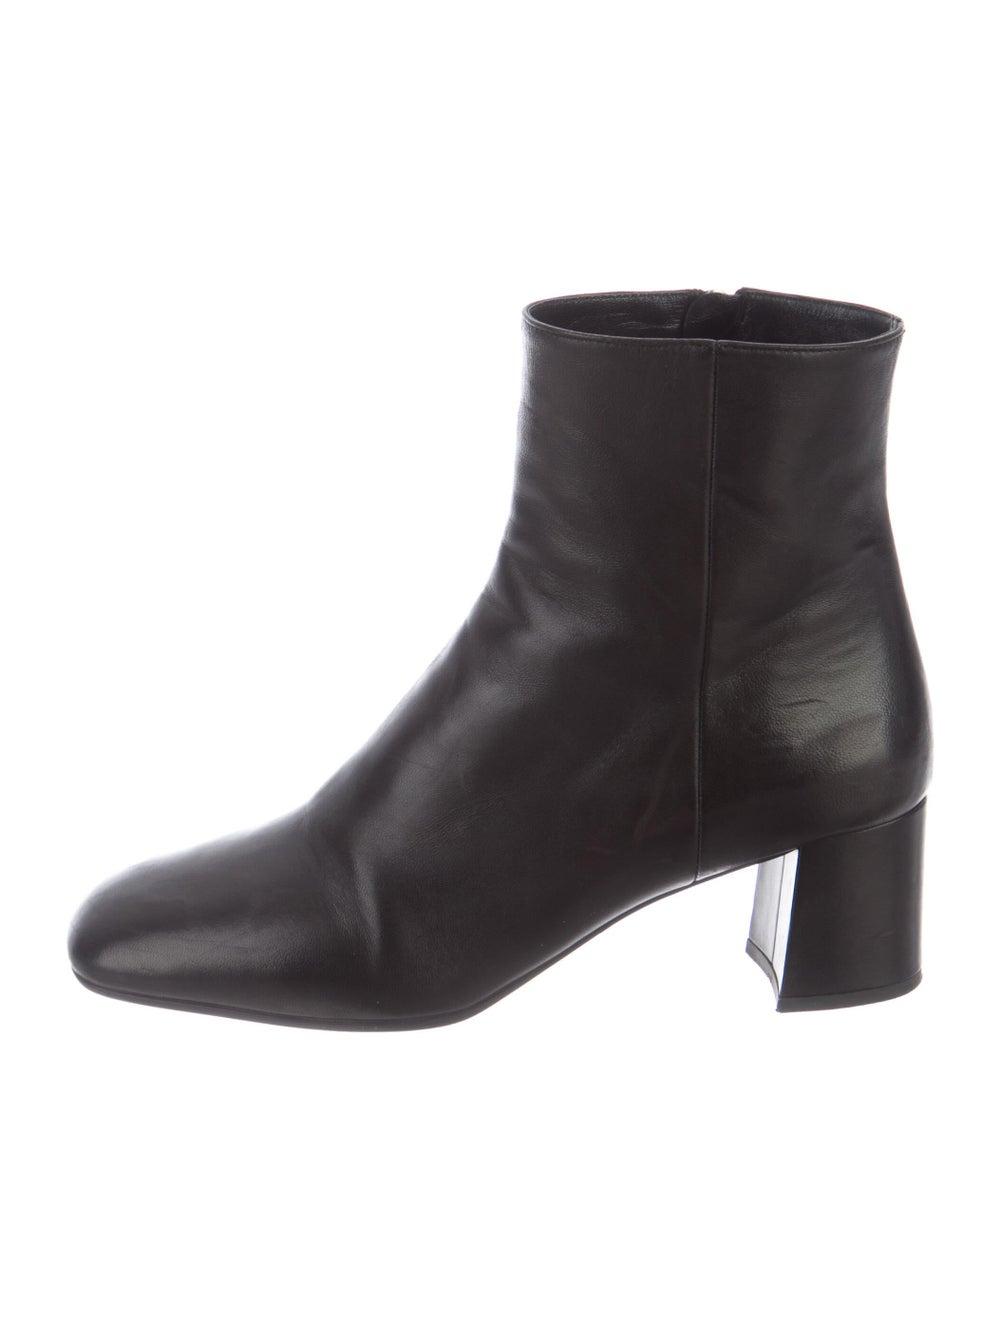 Prada Leather Boots Black - image 1